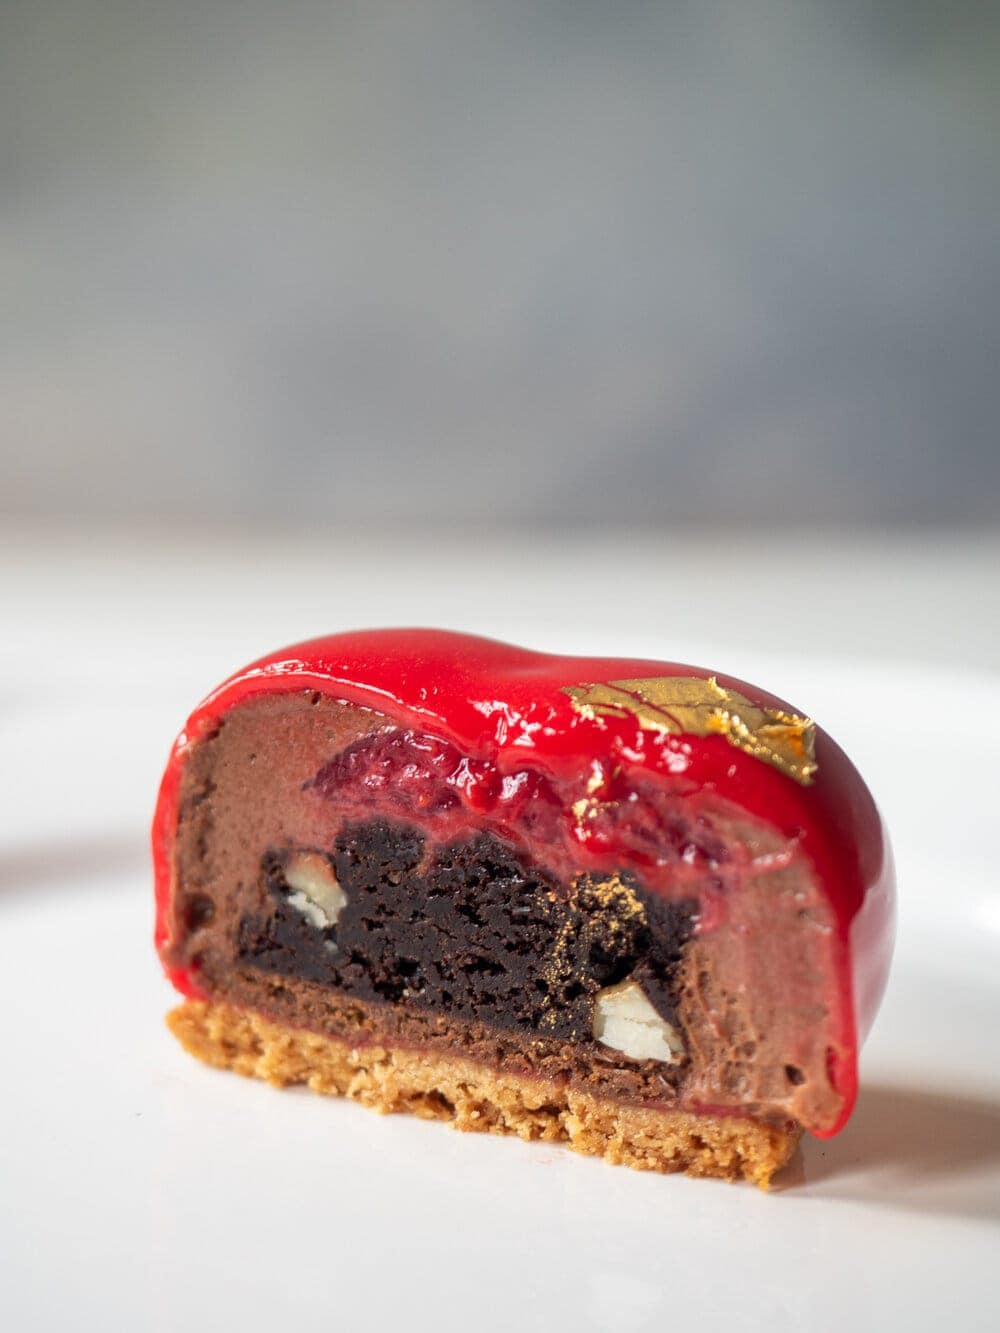 Chocolate, hazelnut and raspberry petit gateaux